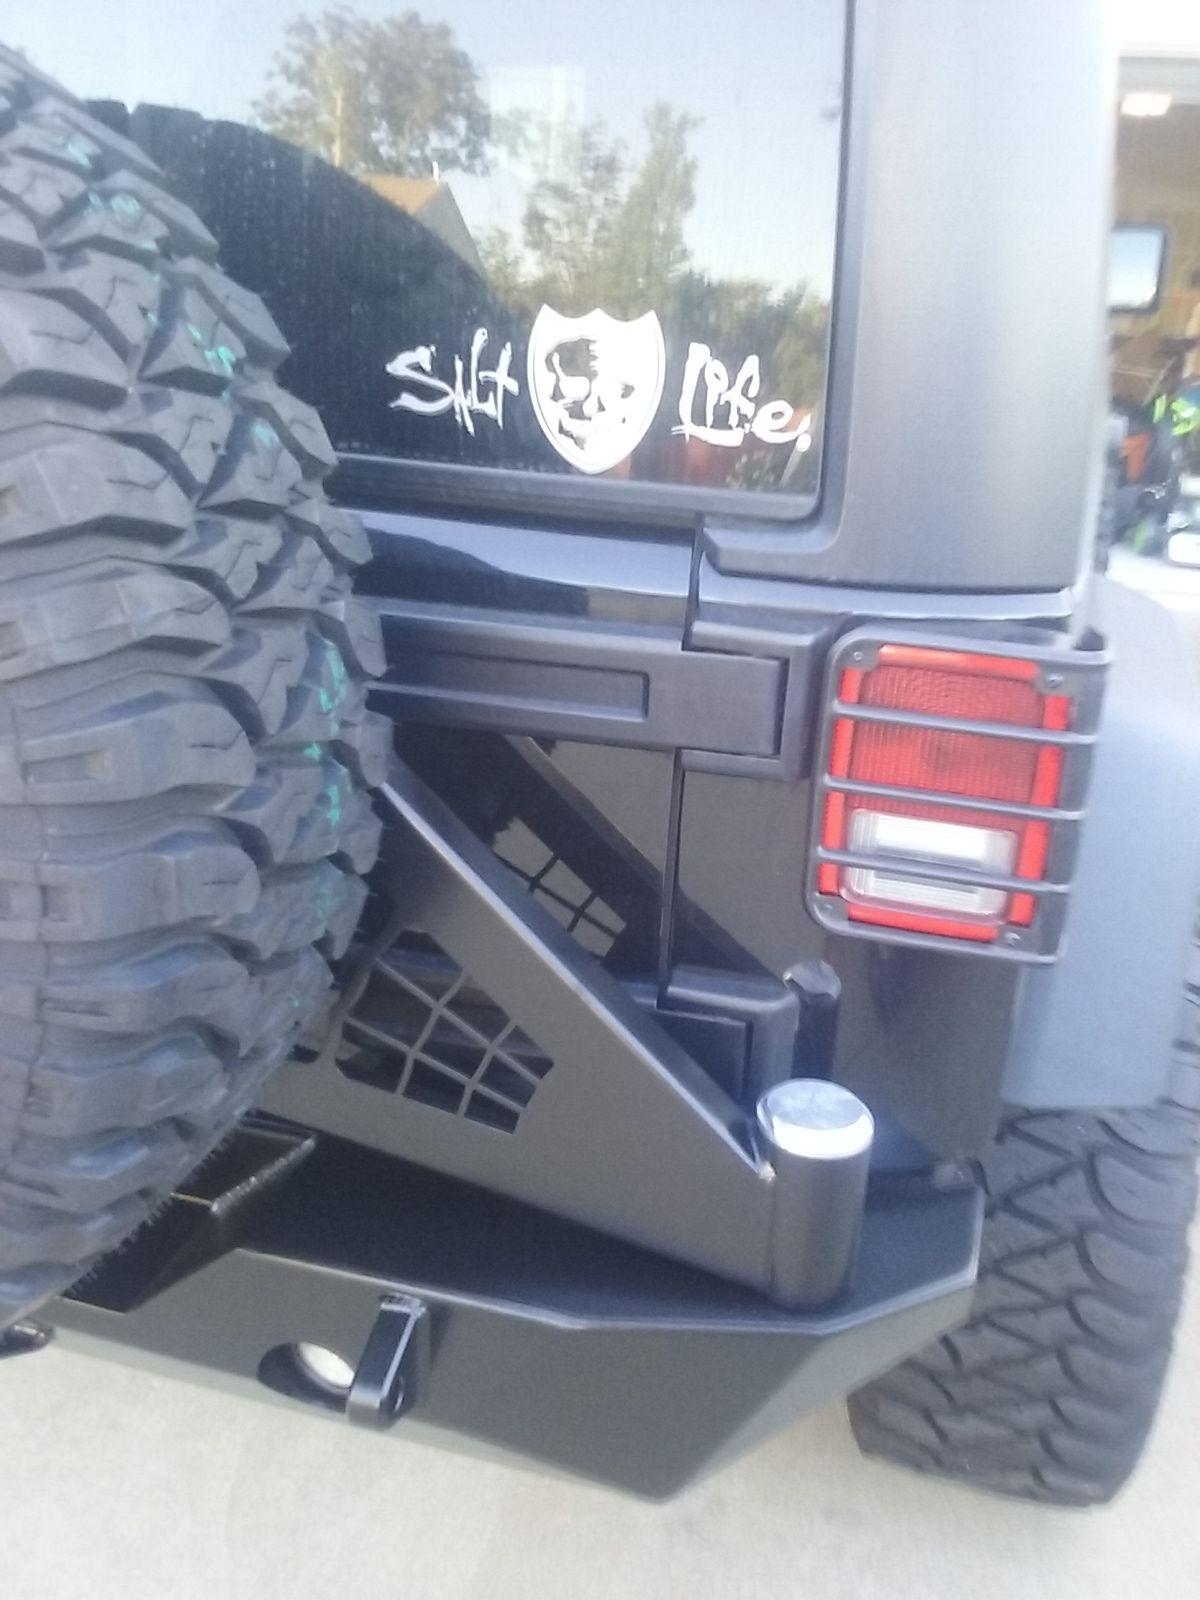 Jeep Wrangler Jk Rearbumper Jeep Wrangler Jk Rear Bumpers